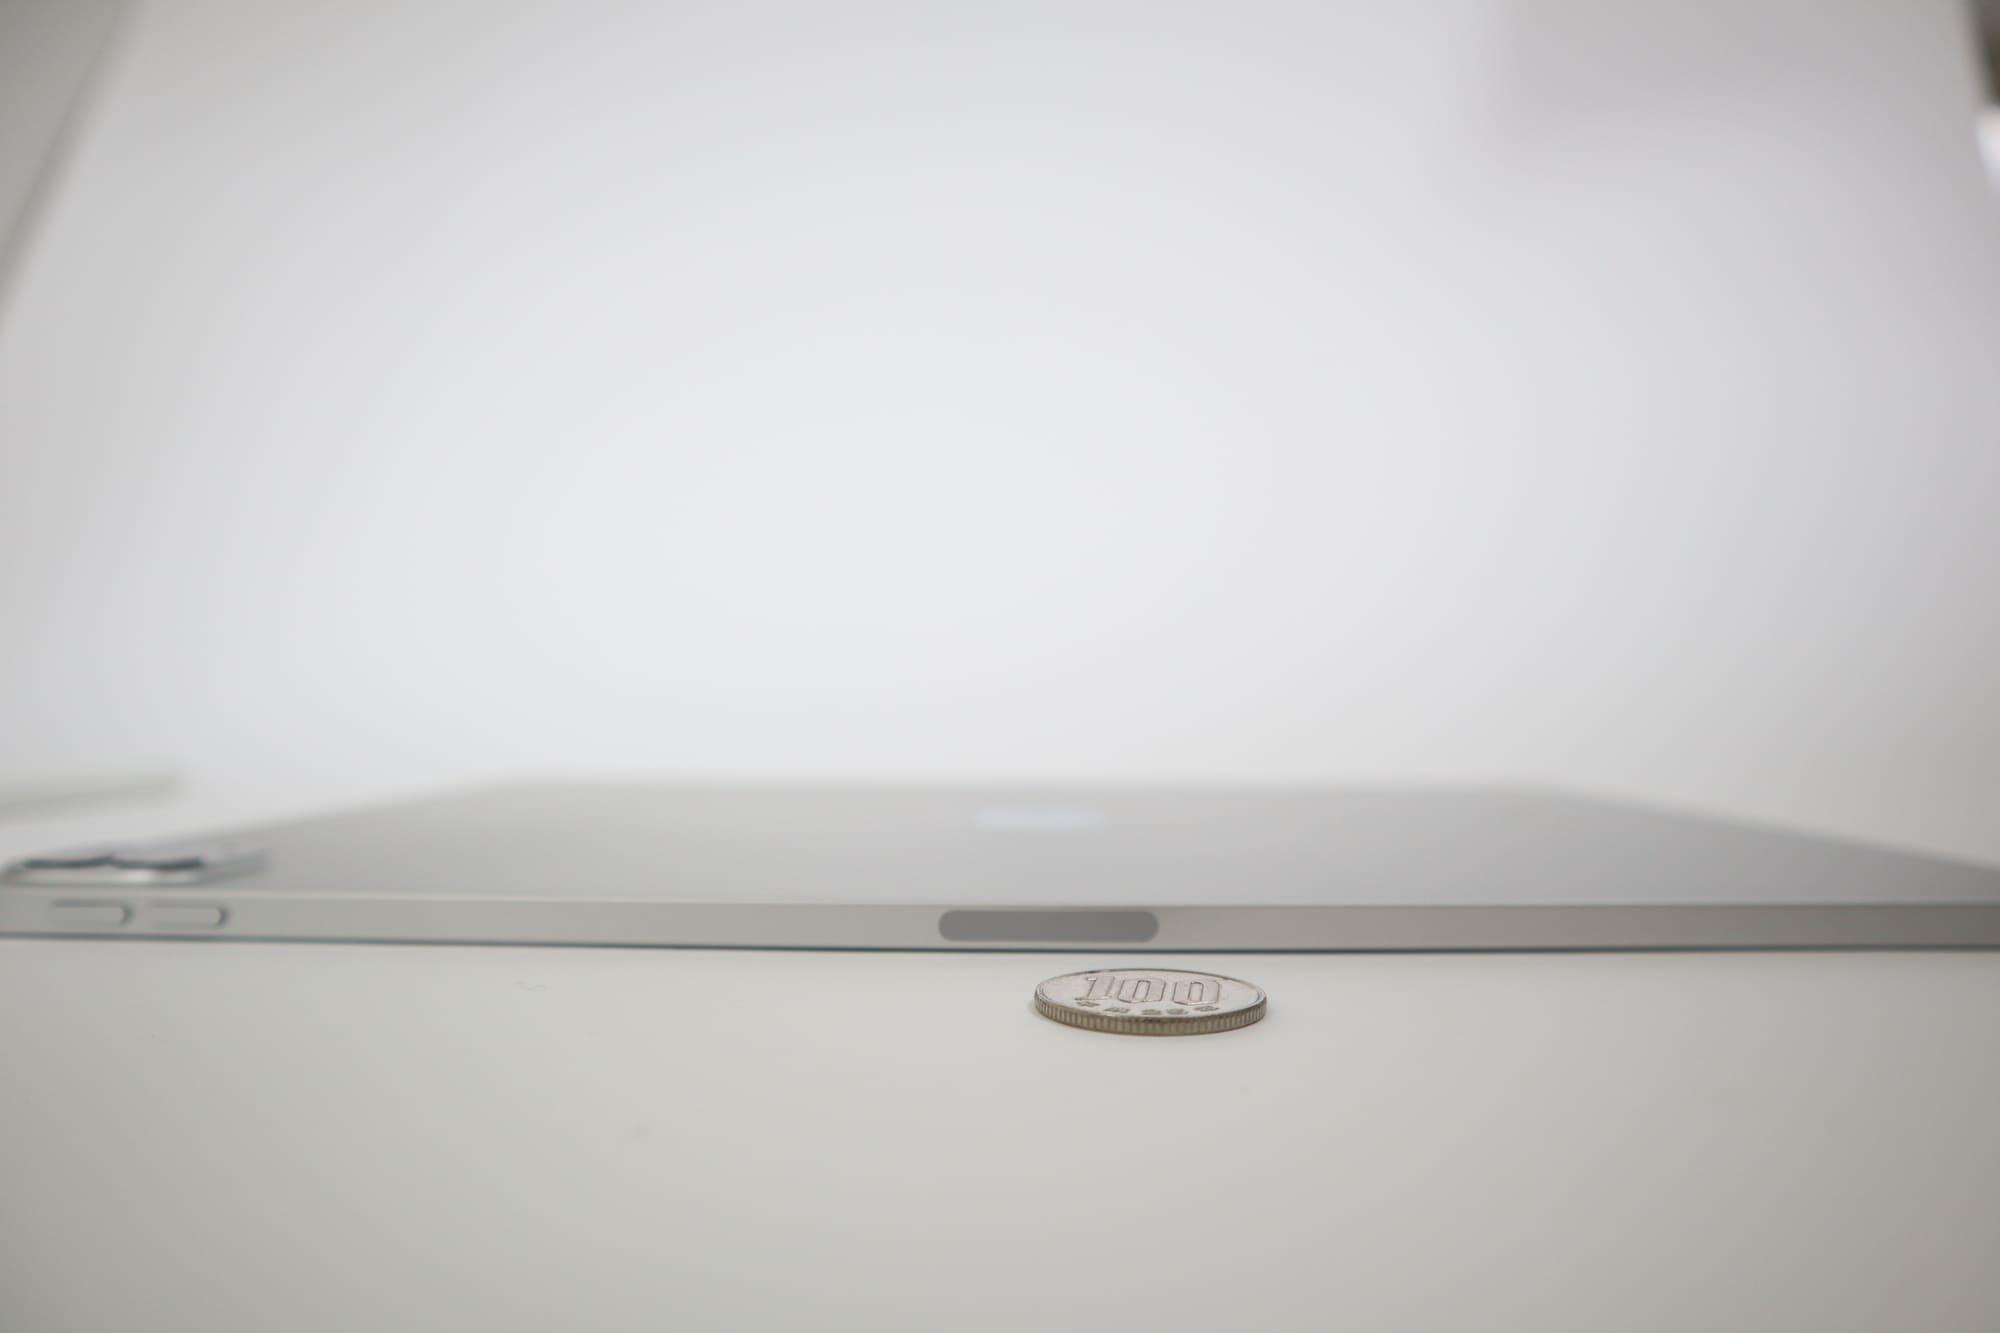 iPad Proの薄さ